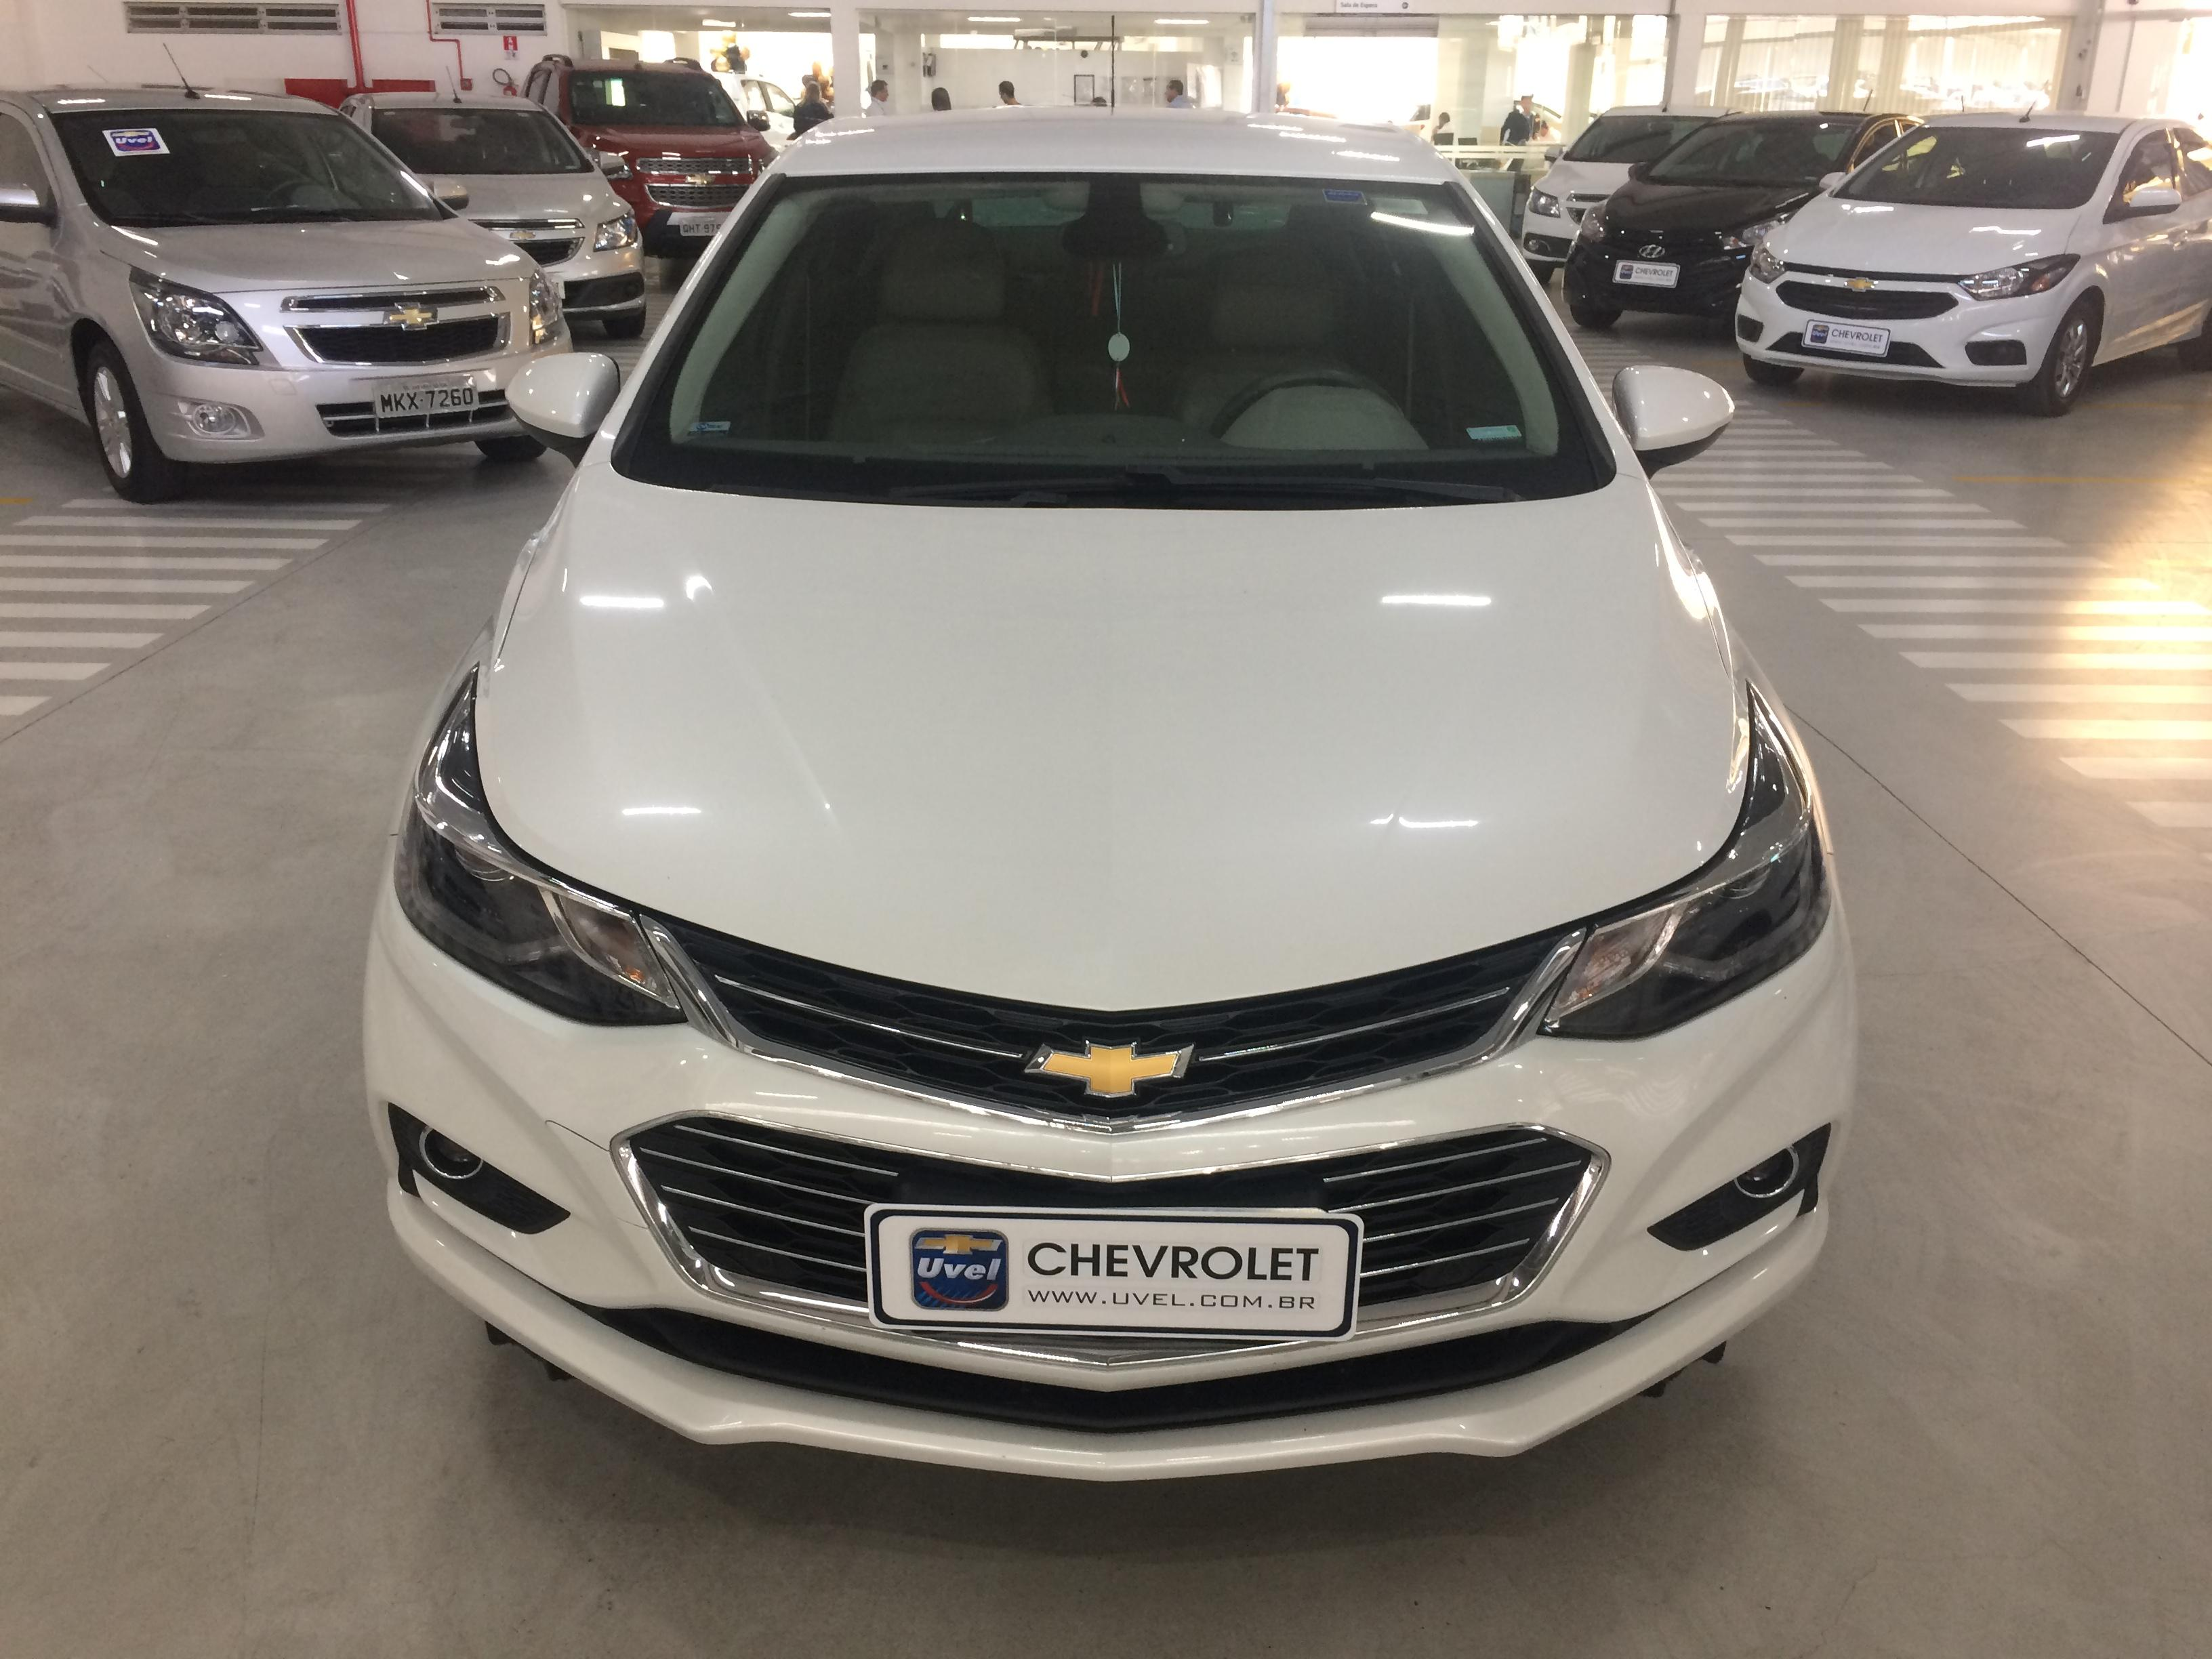 Chevrolet CRUZE SEDAN LTZ 1.4T 2017